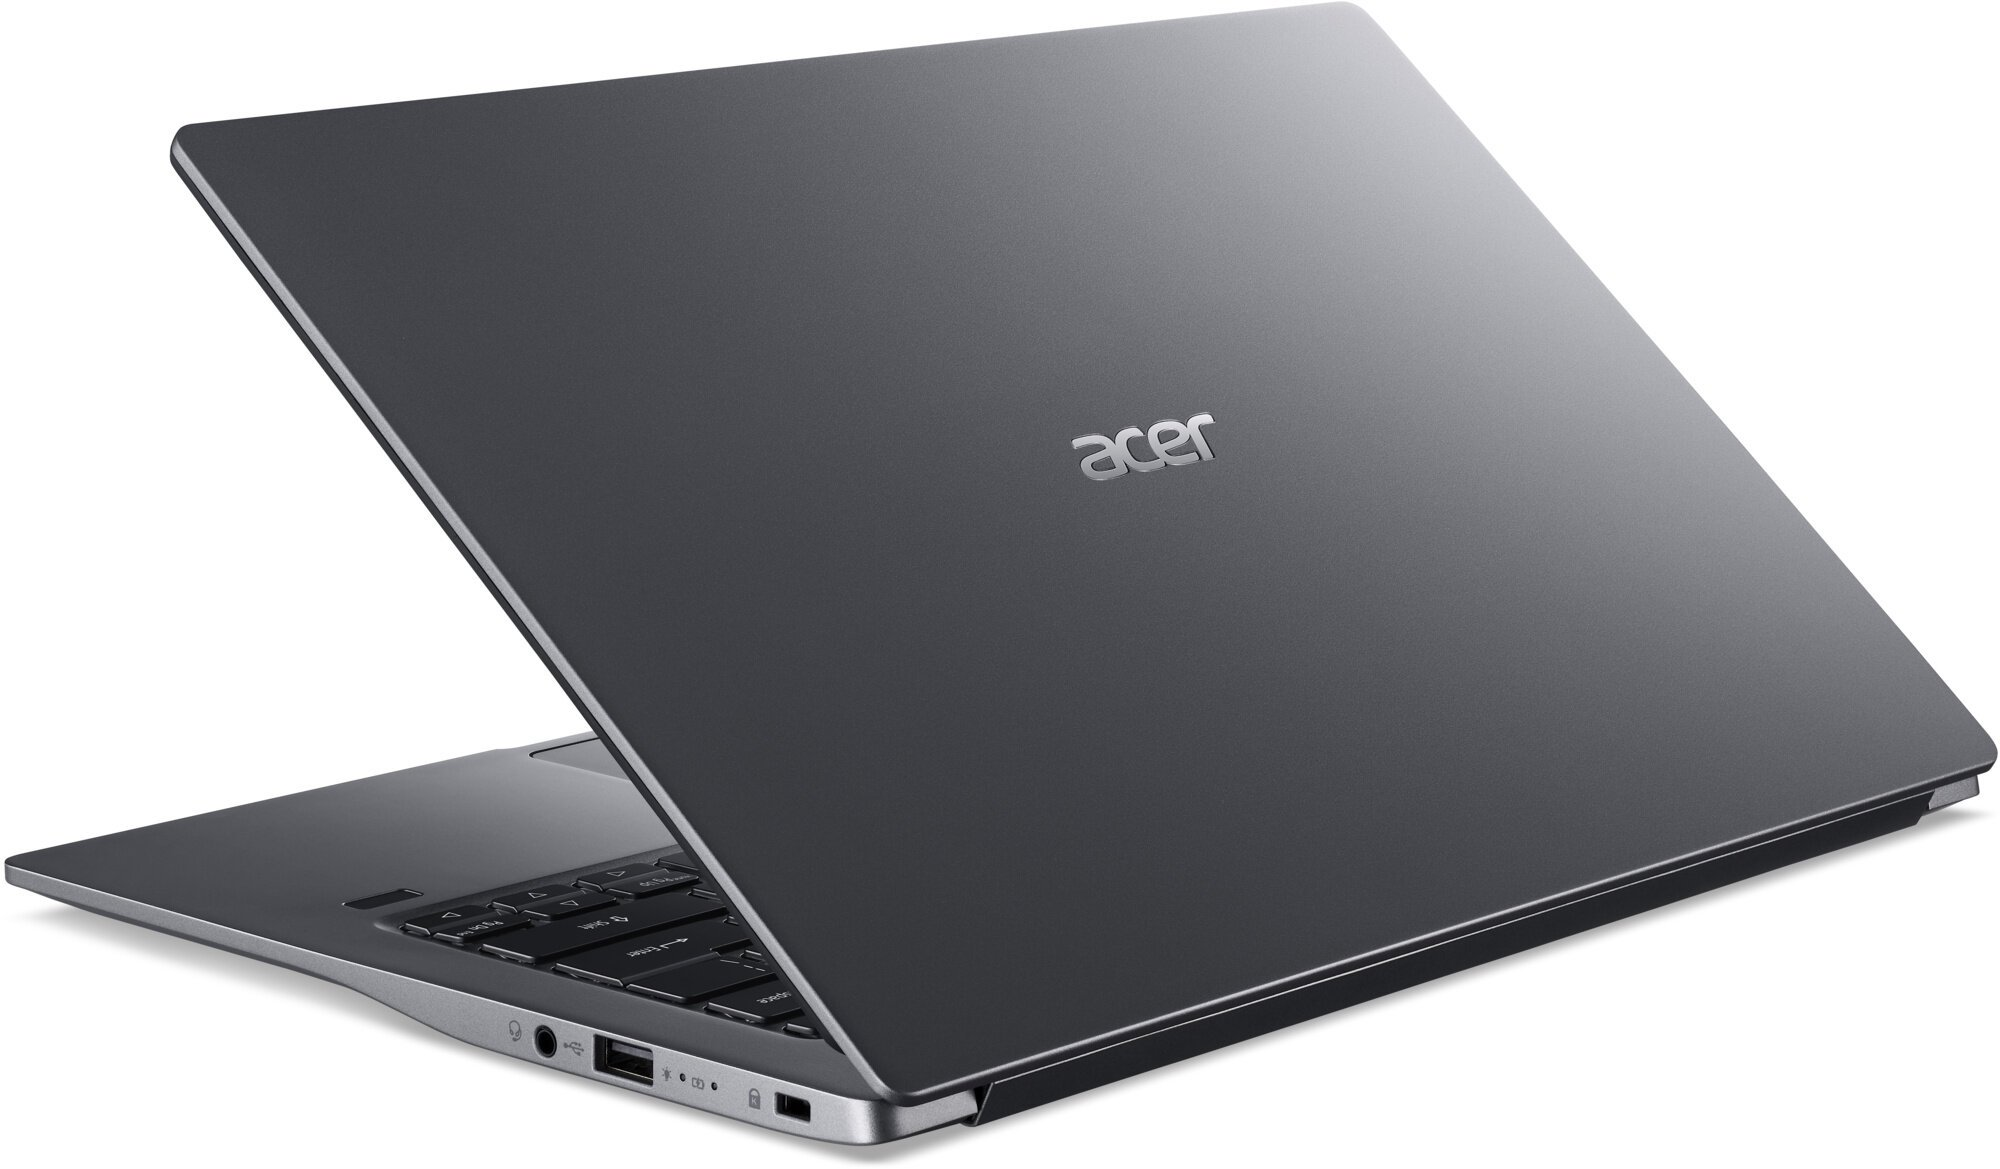 Acer Swift 3 SF314-57-50SQ